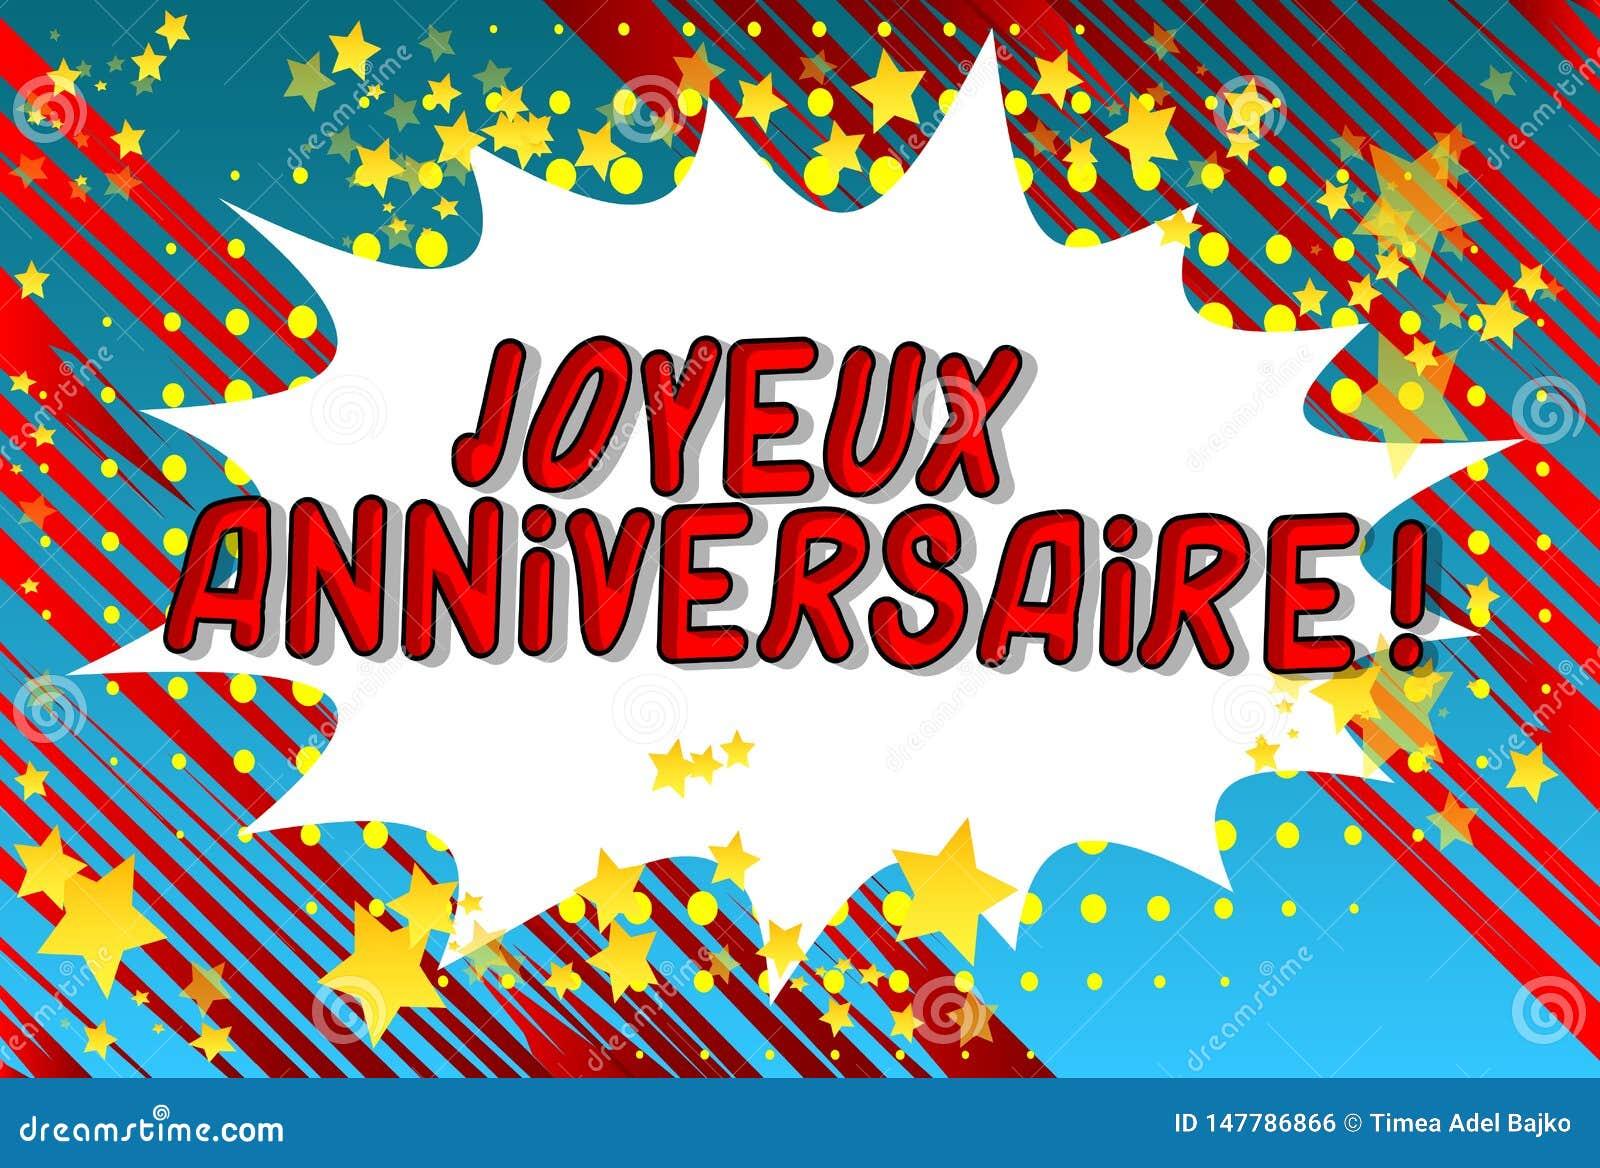 Joyeux Anniversaire Happy Birthday In French Stock Vector Illustration Of Bomb Bubble 147786866